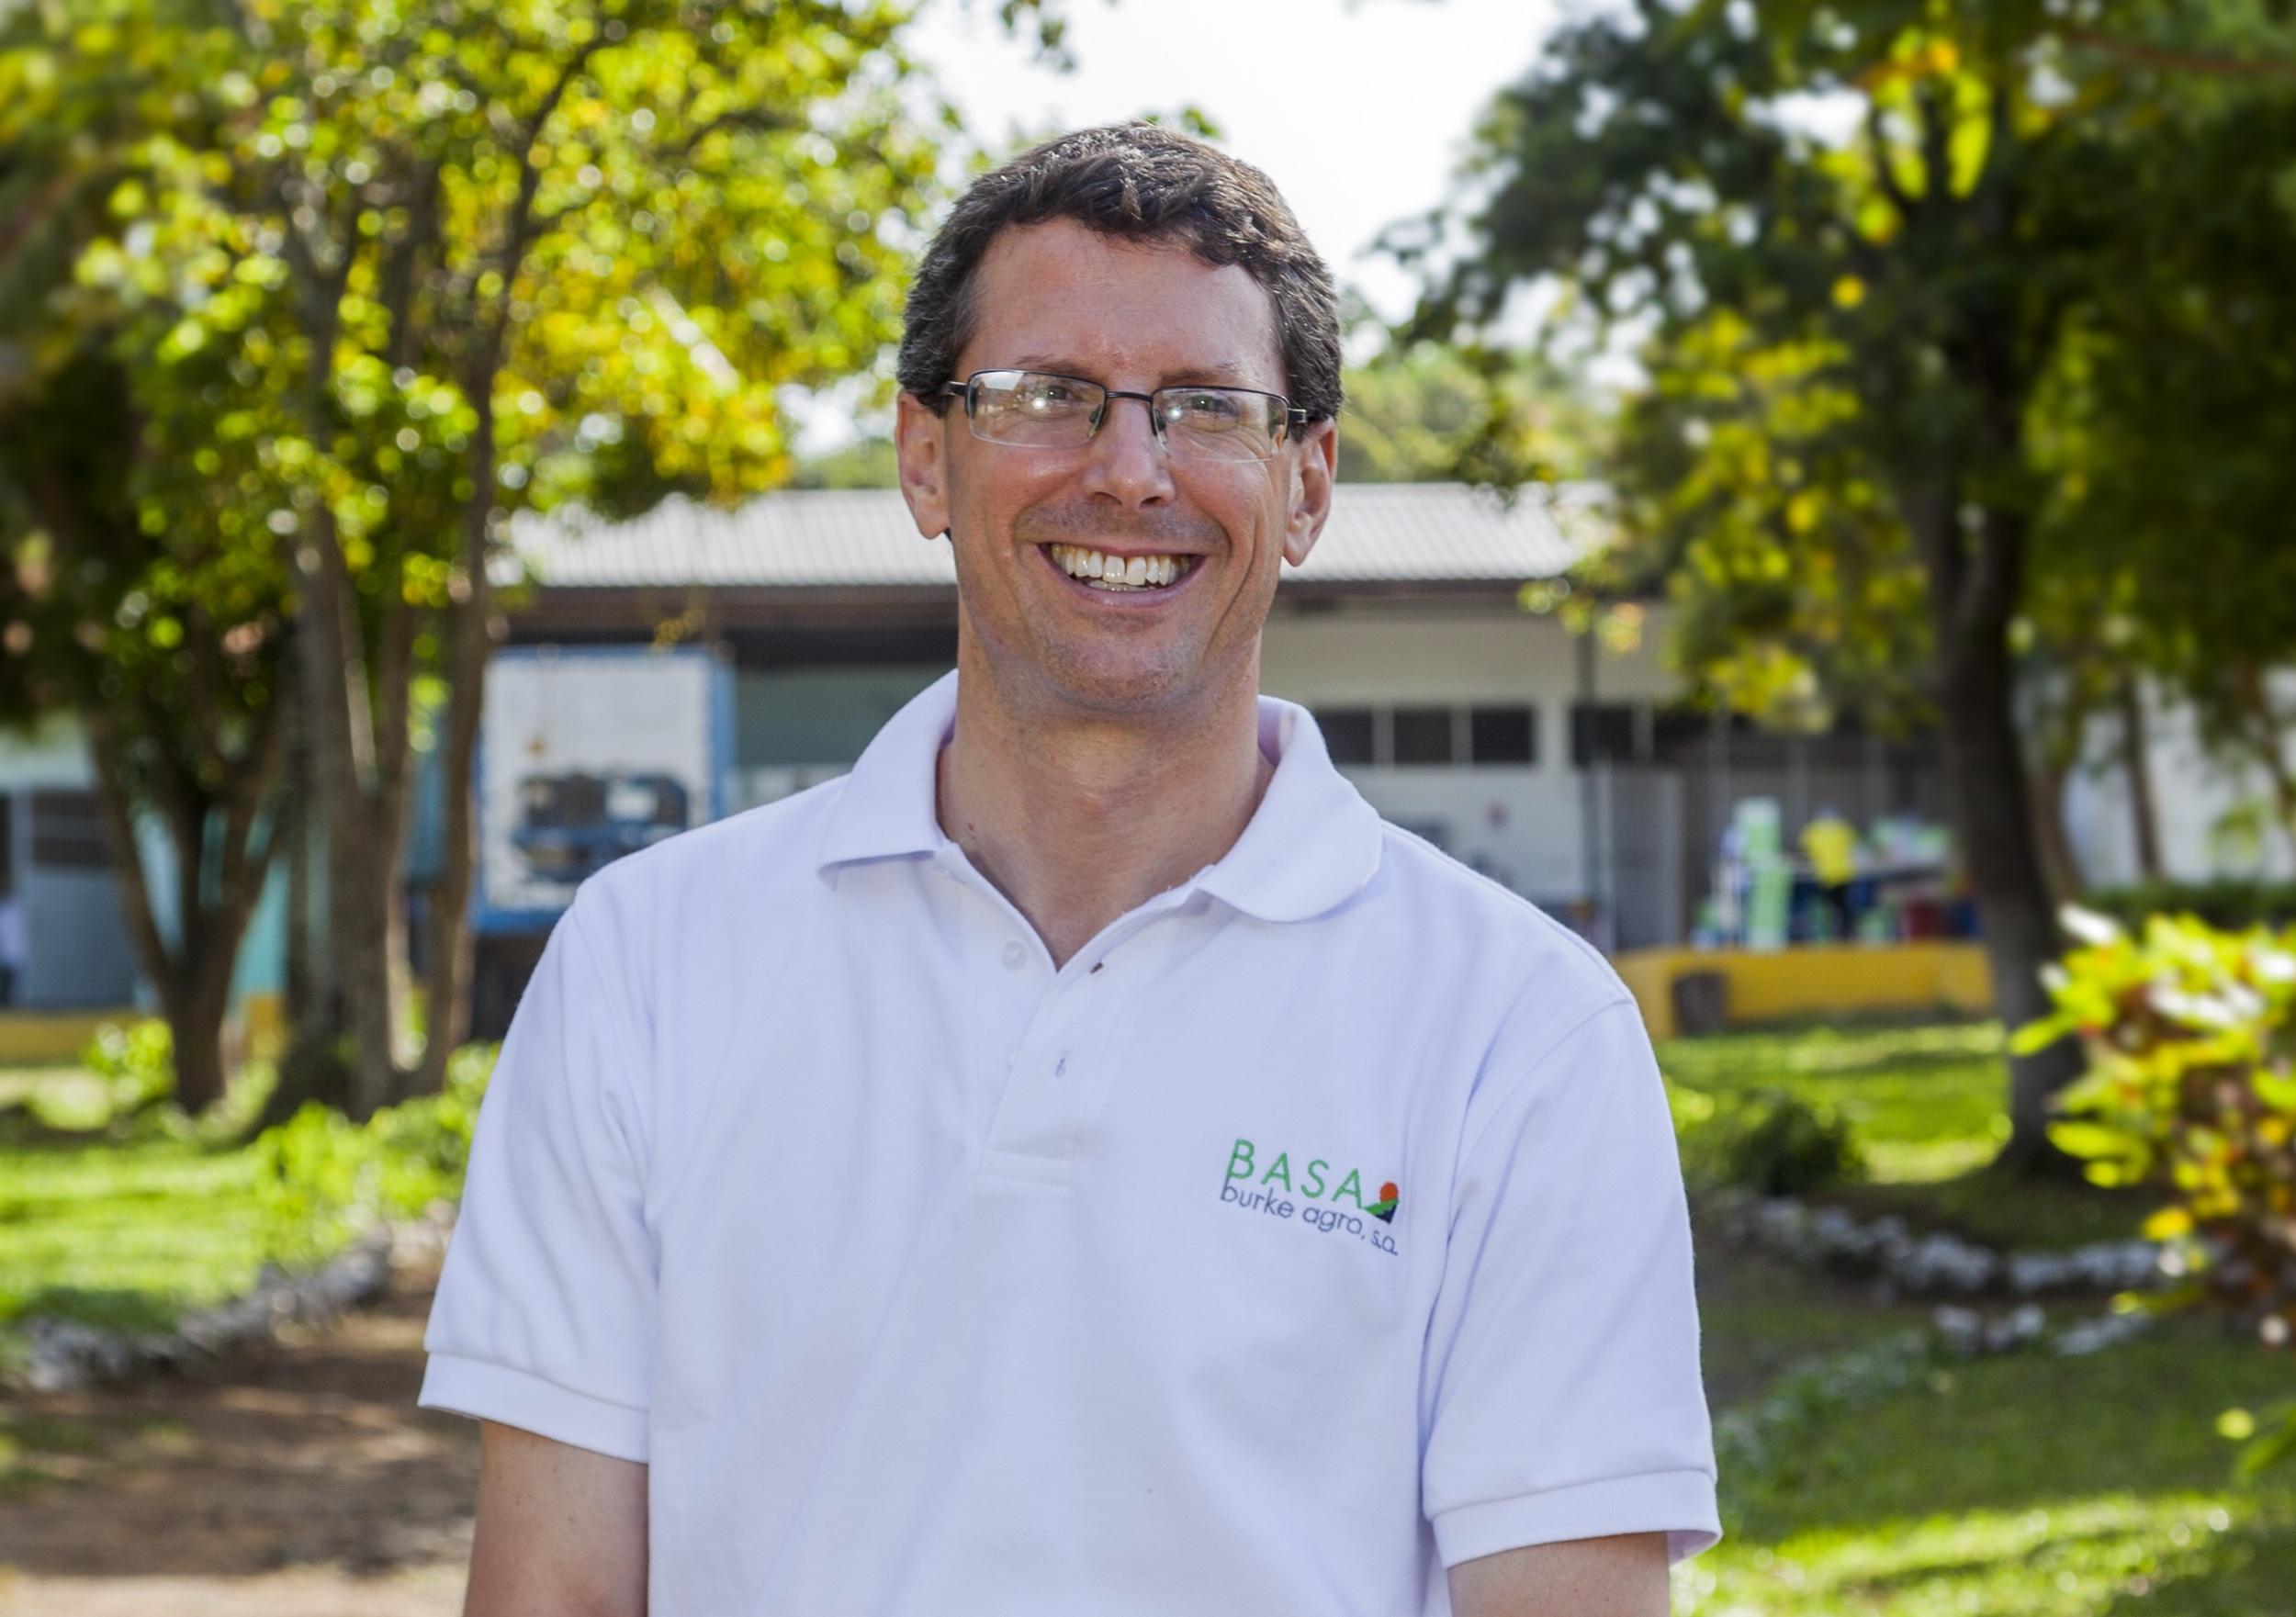 Paul davidson   Operations & project manager  pdavidson@solorganica.com